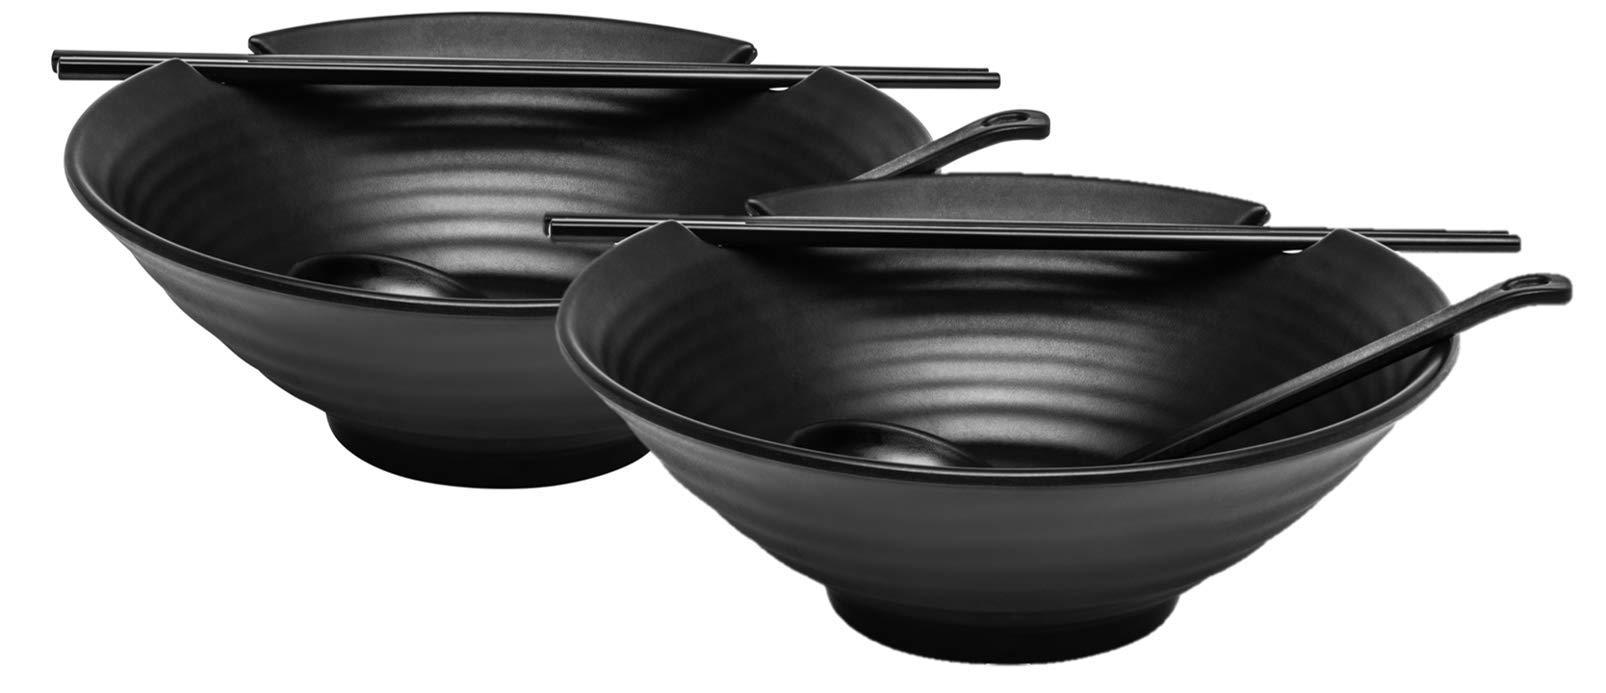 2 x Ramen Bowl Set (Black Melamine), Japanese Style Soup Bowls with Chopsticks and Ladle Spoons Set and Large 37 oz Bowl